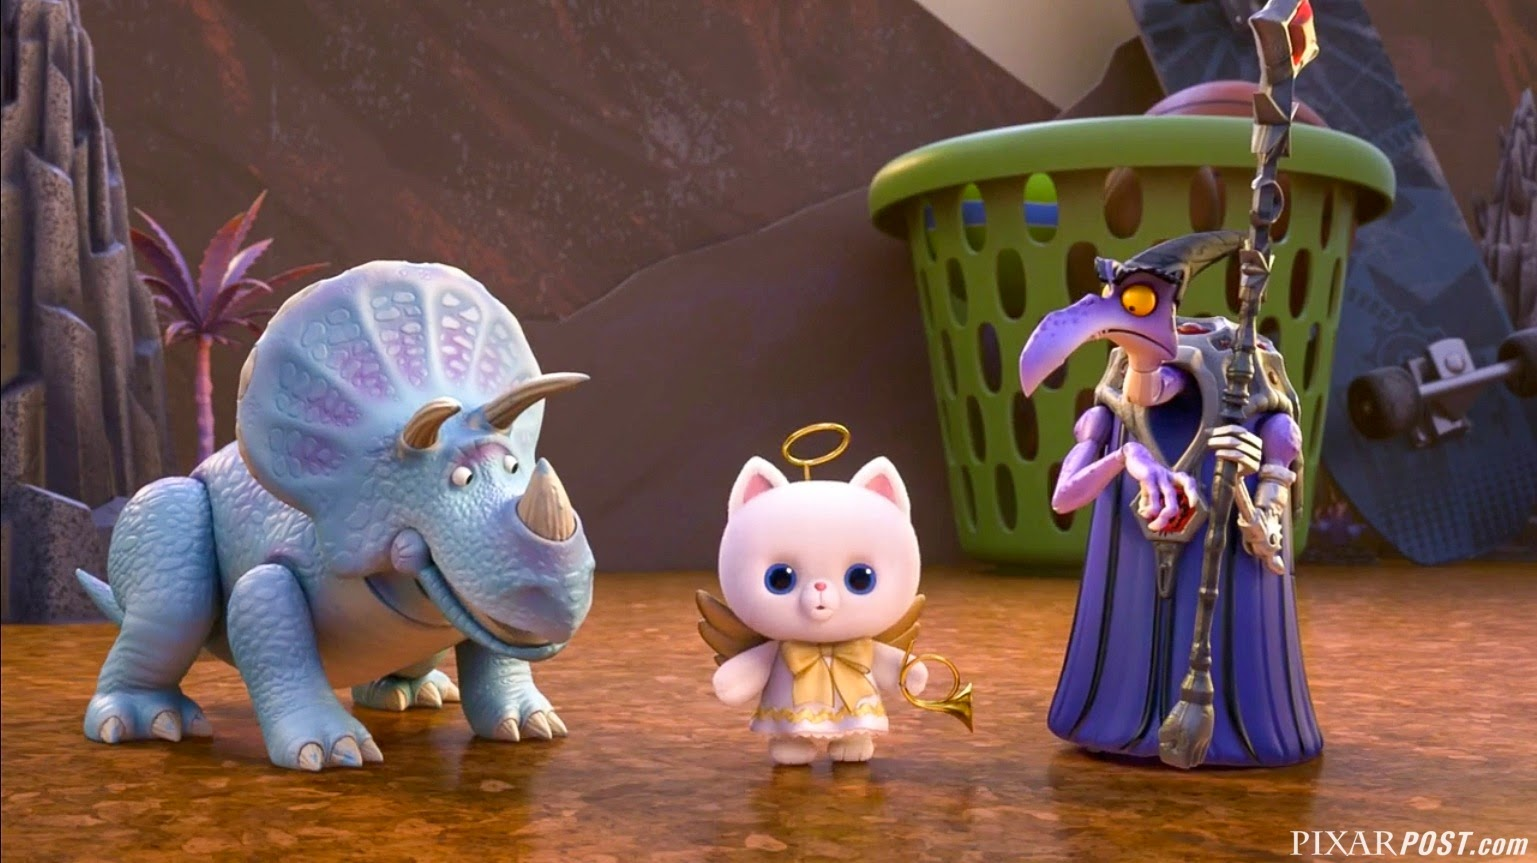 Little Angel Toys : Toy story that time forgot battlesaur sky broadband